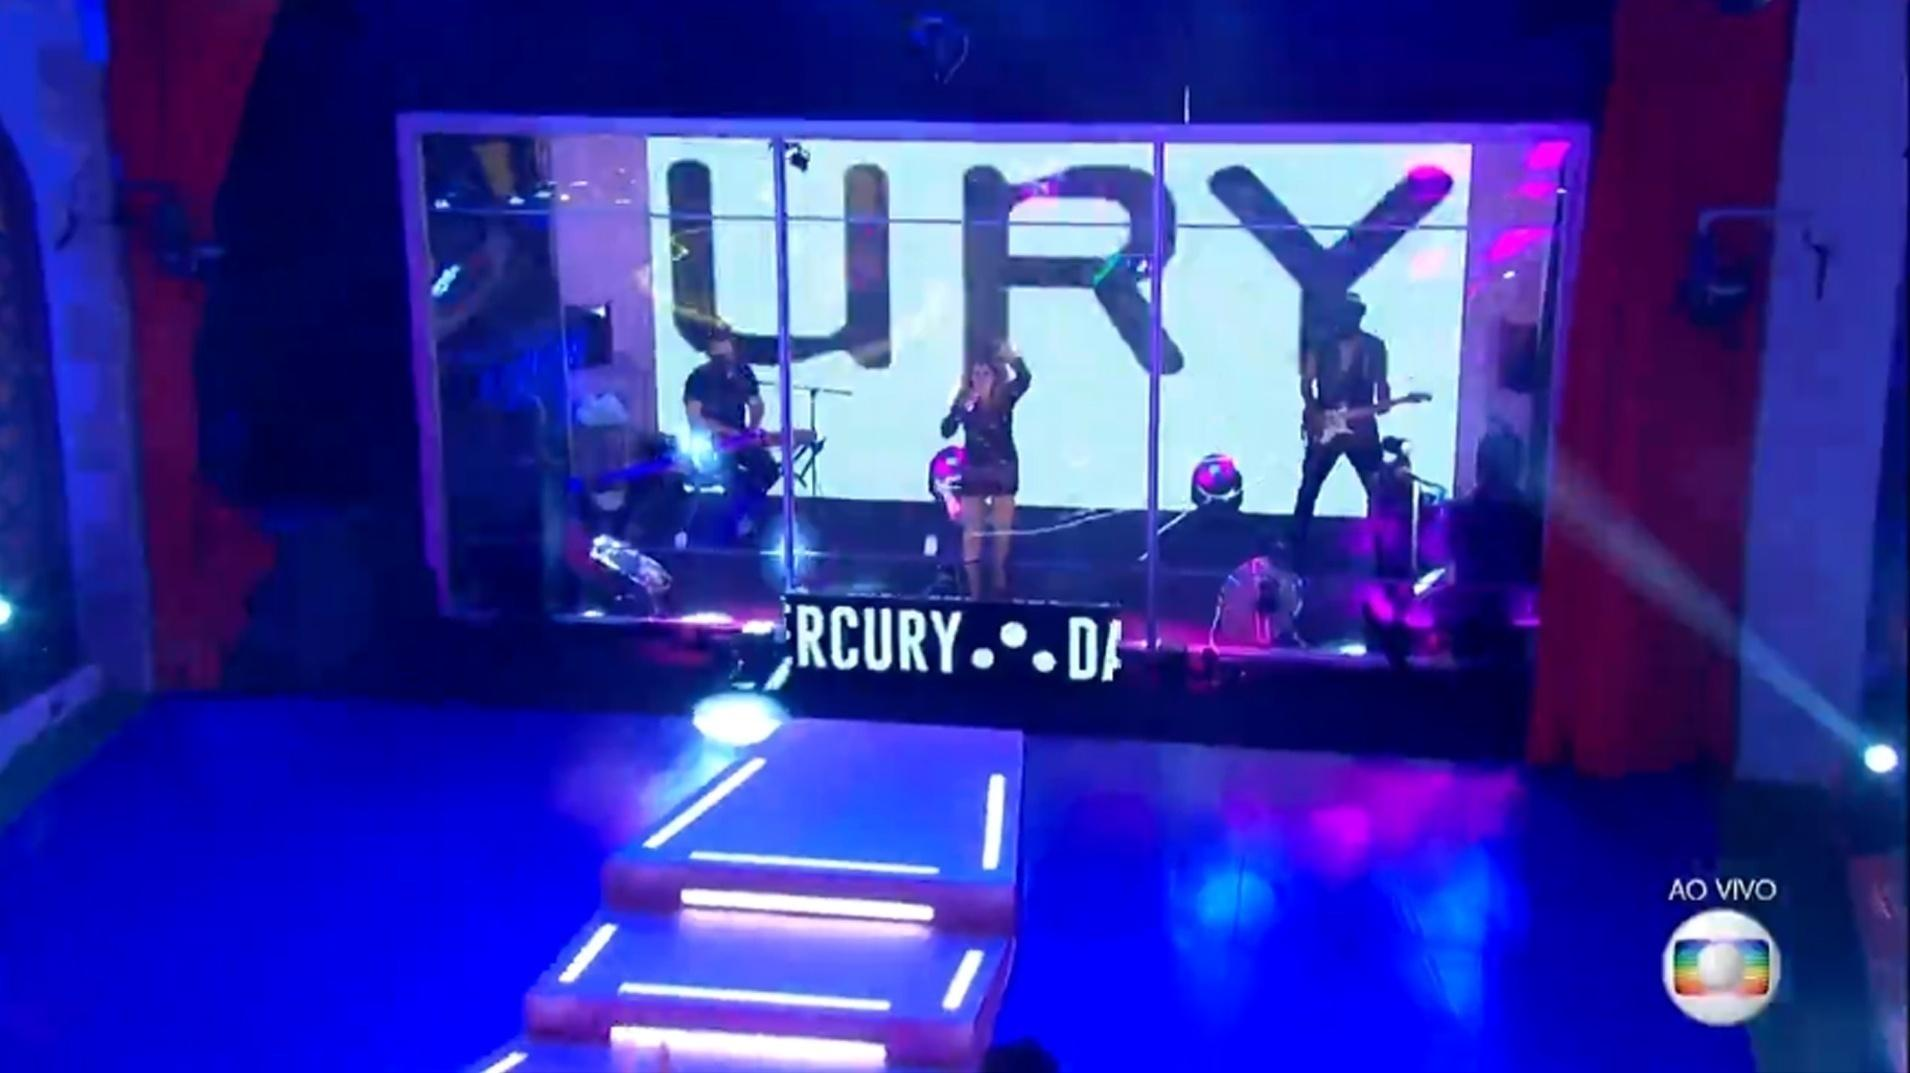 BBB 21: Daniela Mercury rocks a party